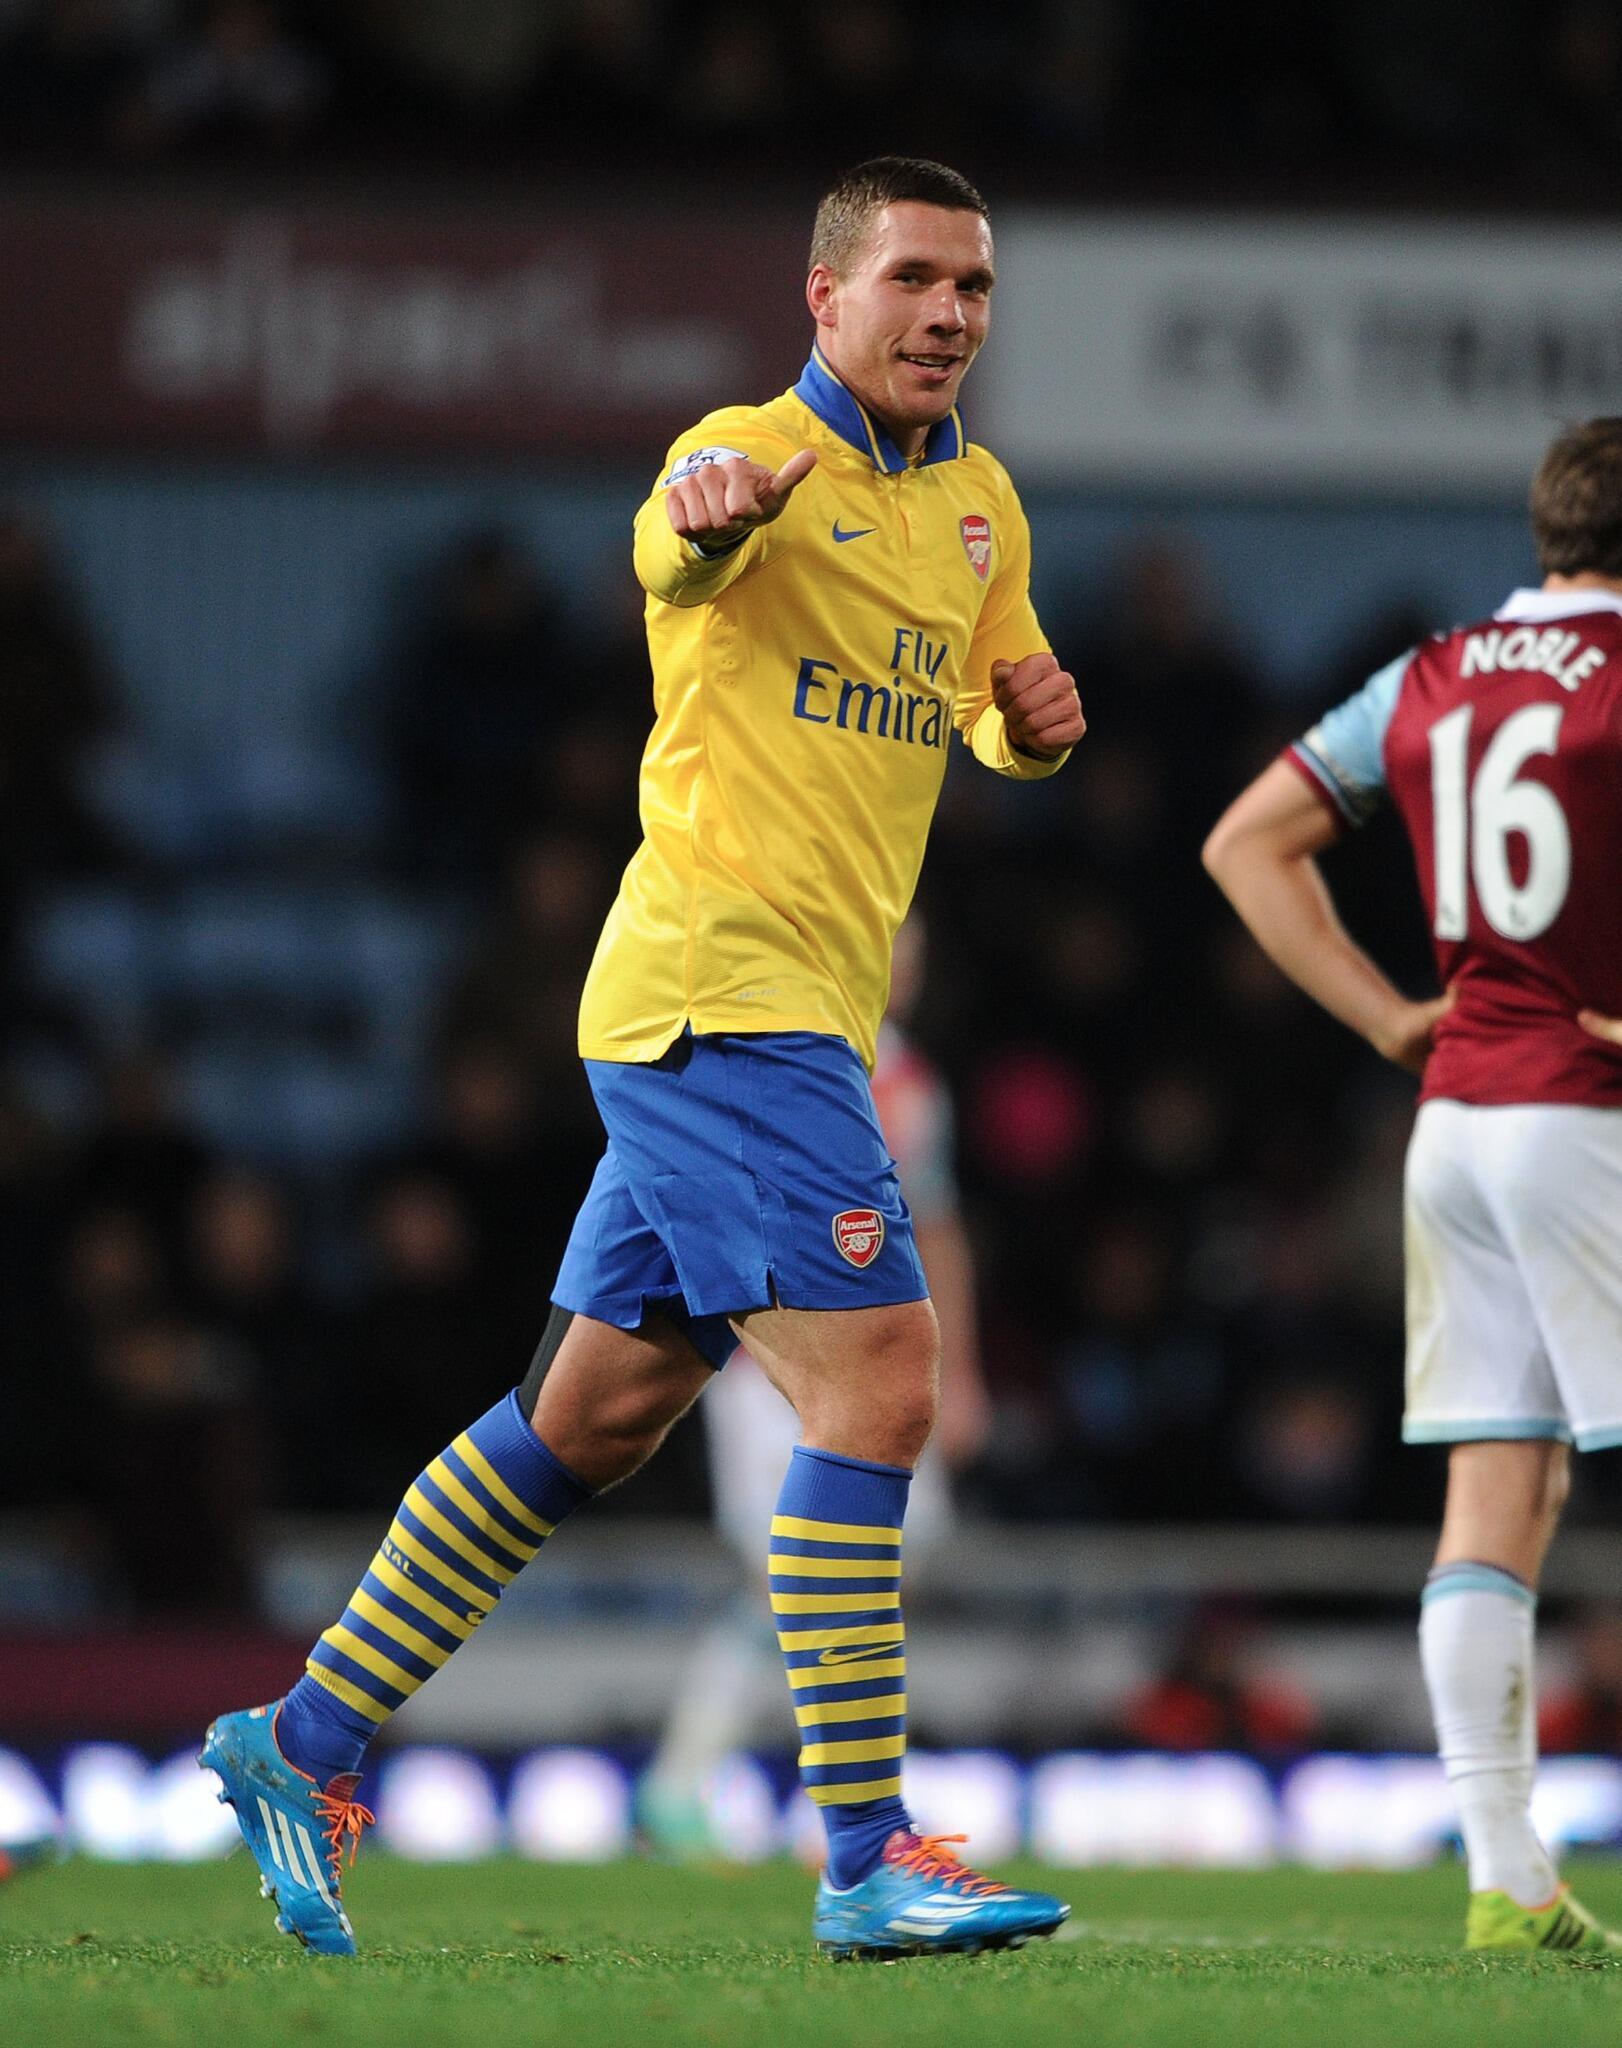 RT @Arsenal: ...@Podolski10 scores. Welcome back #Poldi. #Aha http://t.co/4lE0O2i50p